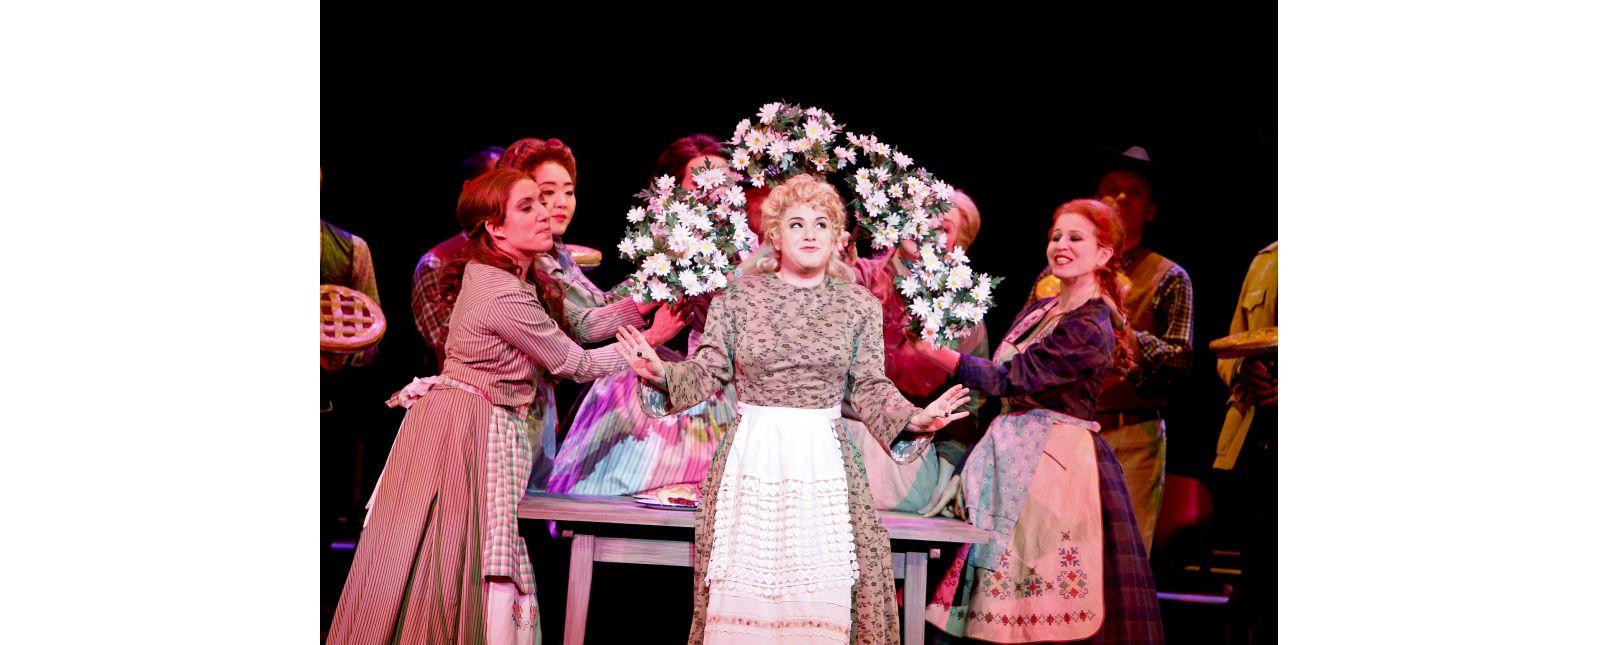 Love Life // Susana Schnell, Rebecca Jo Loeb, Opernchor des Theater Freiburg // 2017 // Birgit Hupfeld